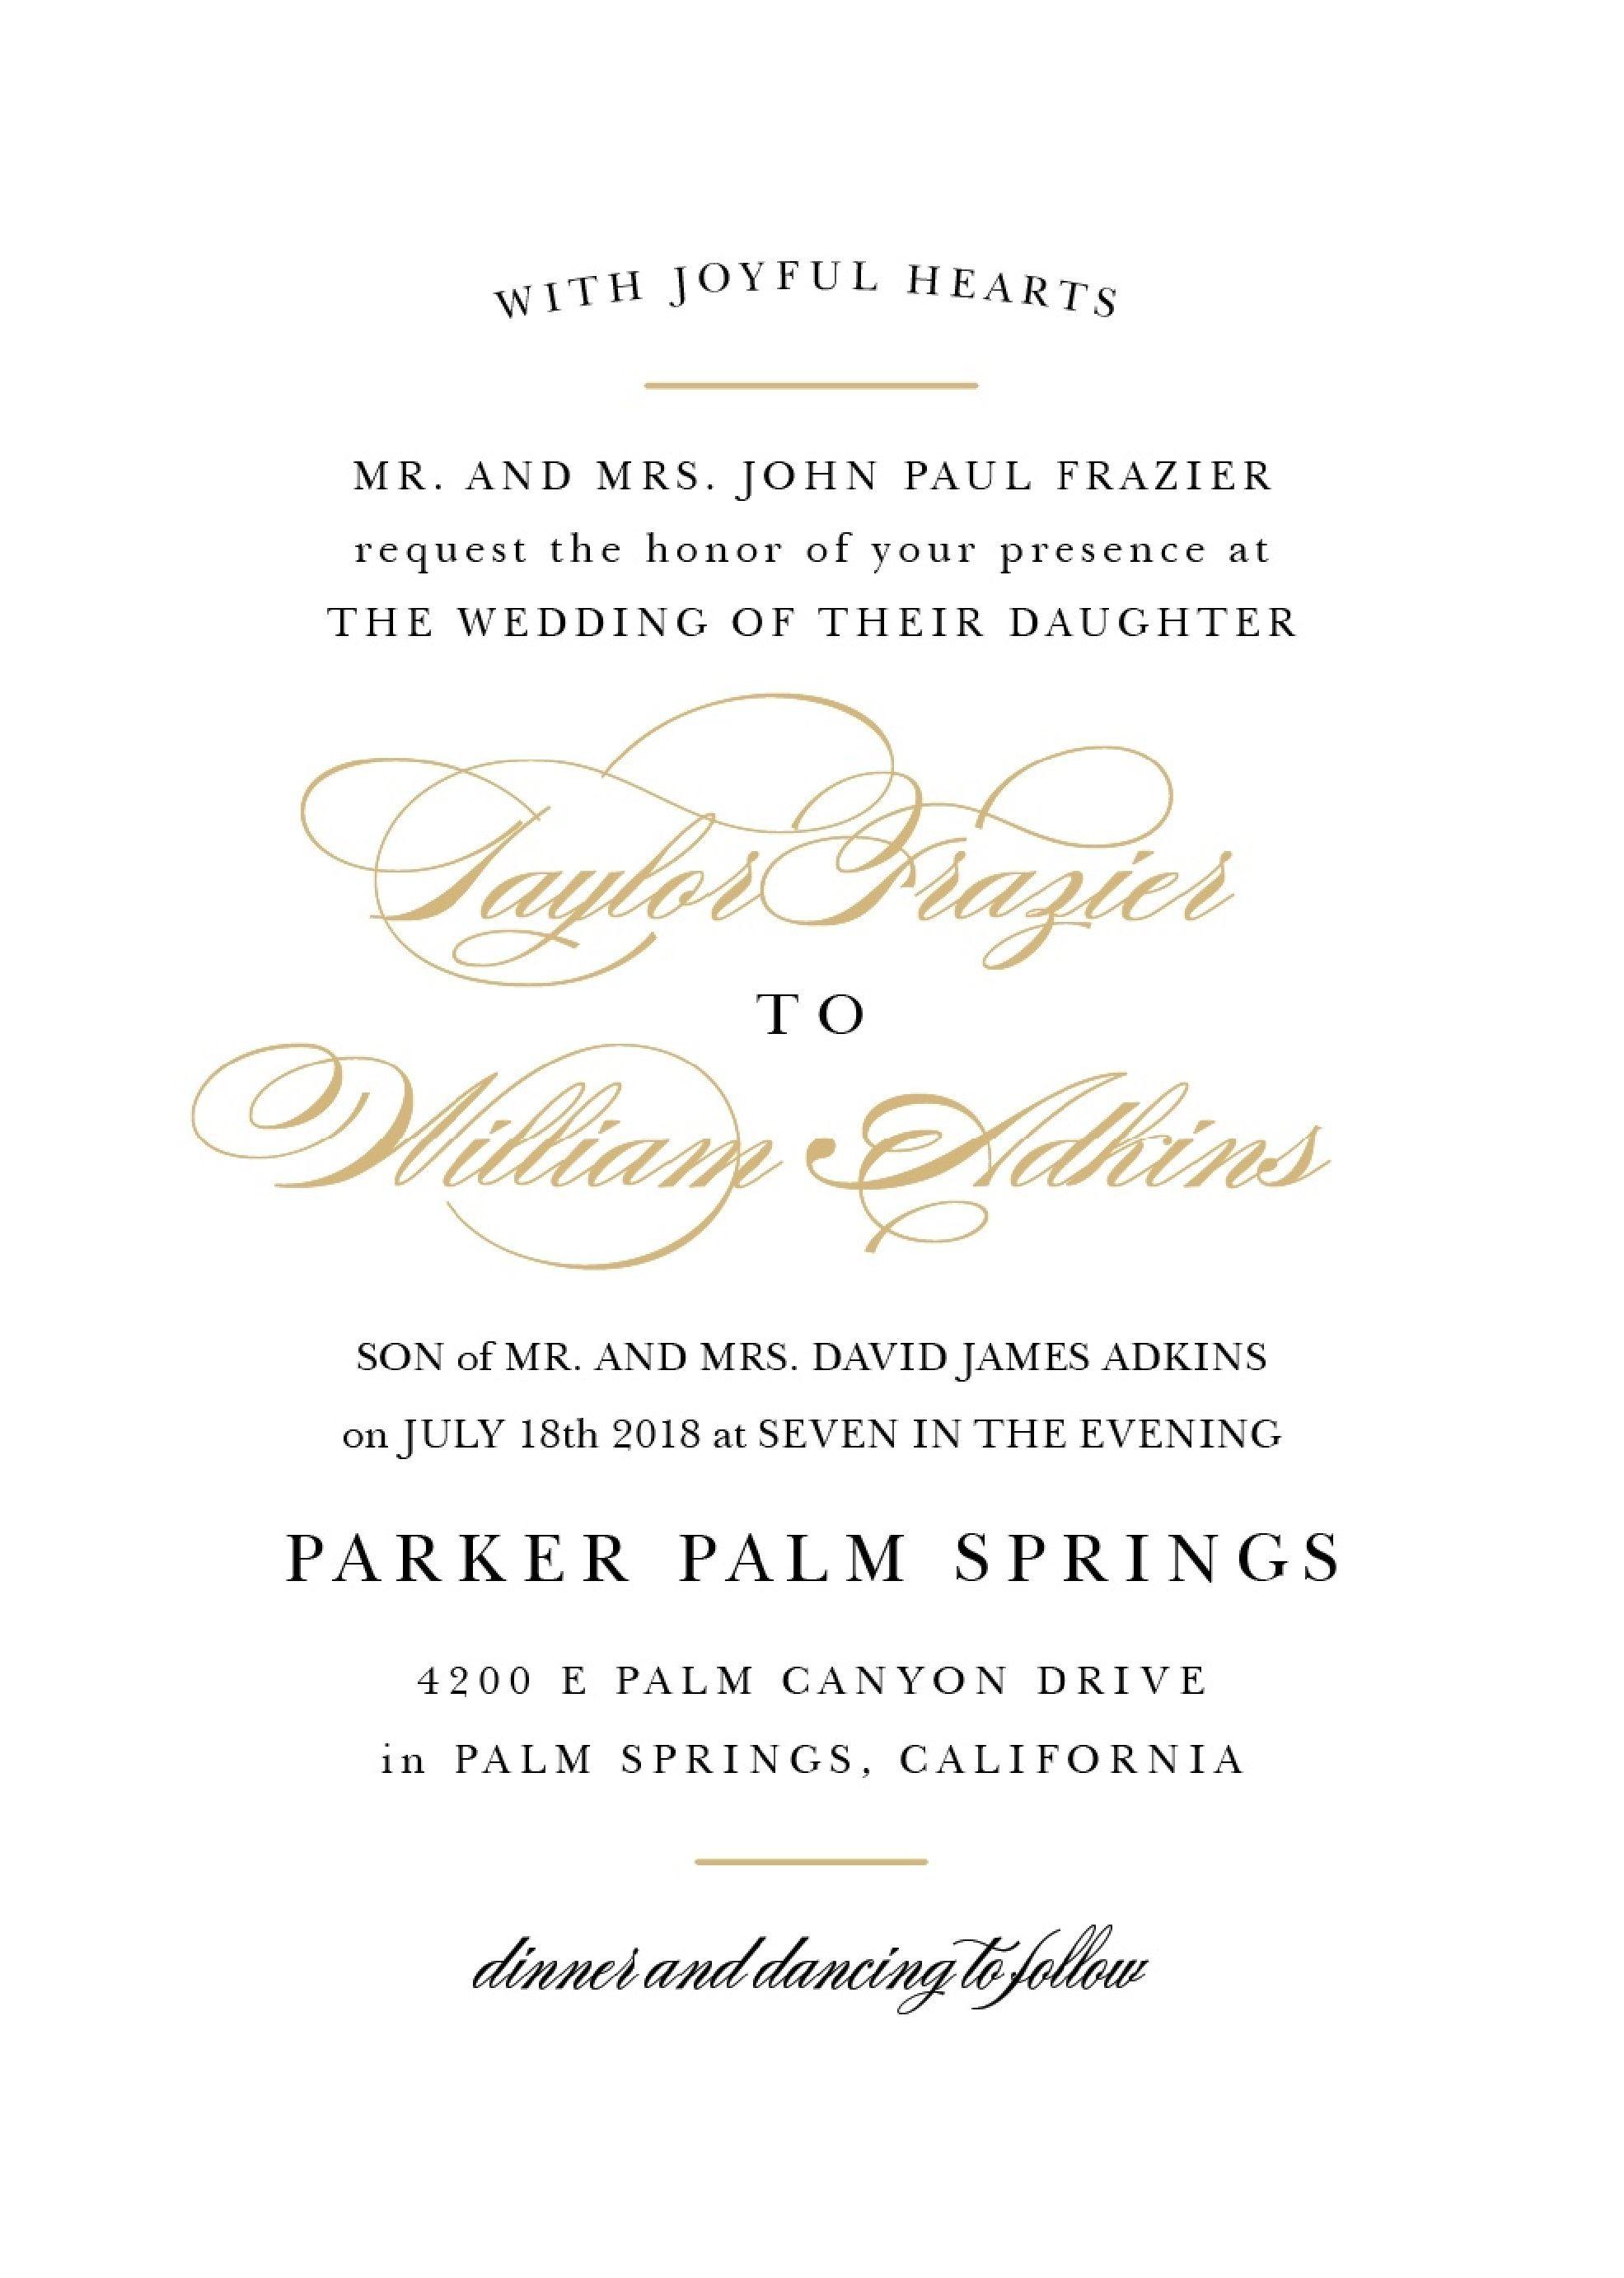 Wedding Invitation Wording Samples Design Wedding Invitations Examples Sample Wedding Invitation Wording Wedding Invitation Wording Templates